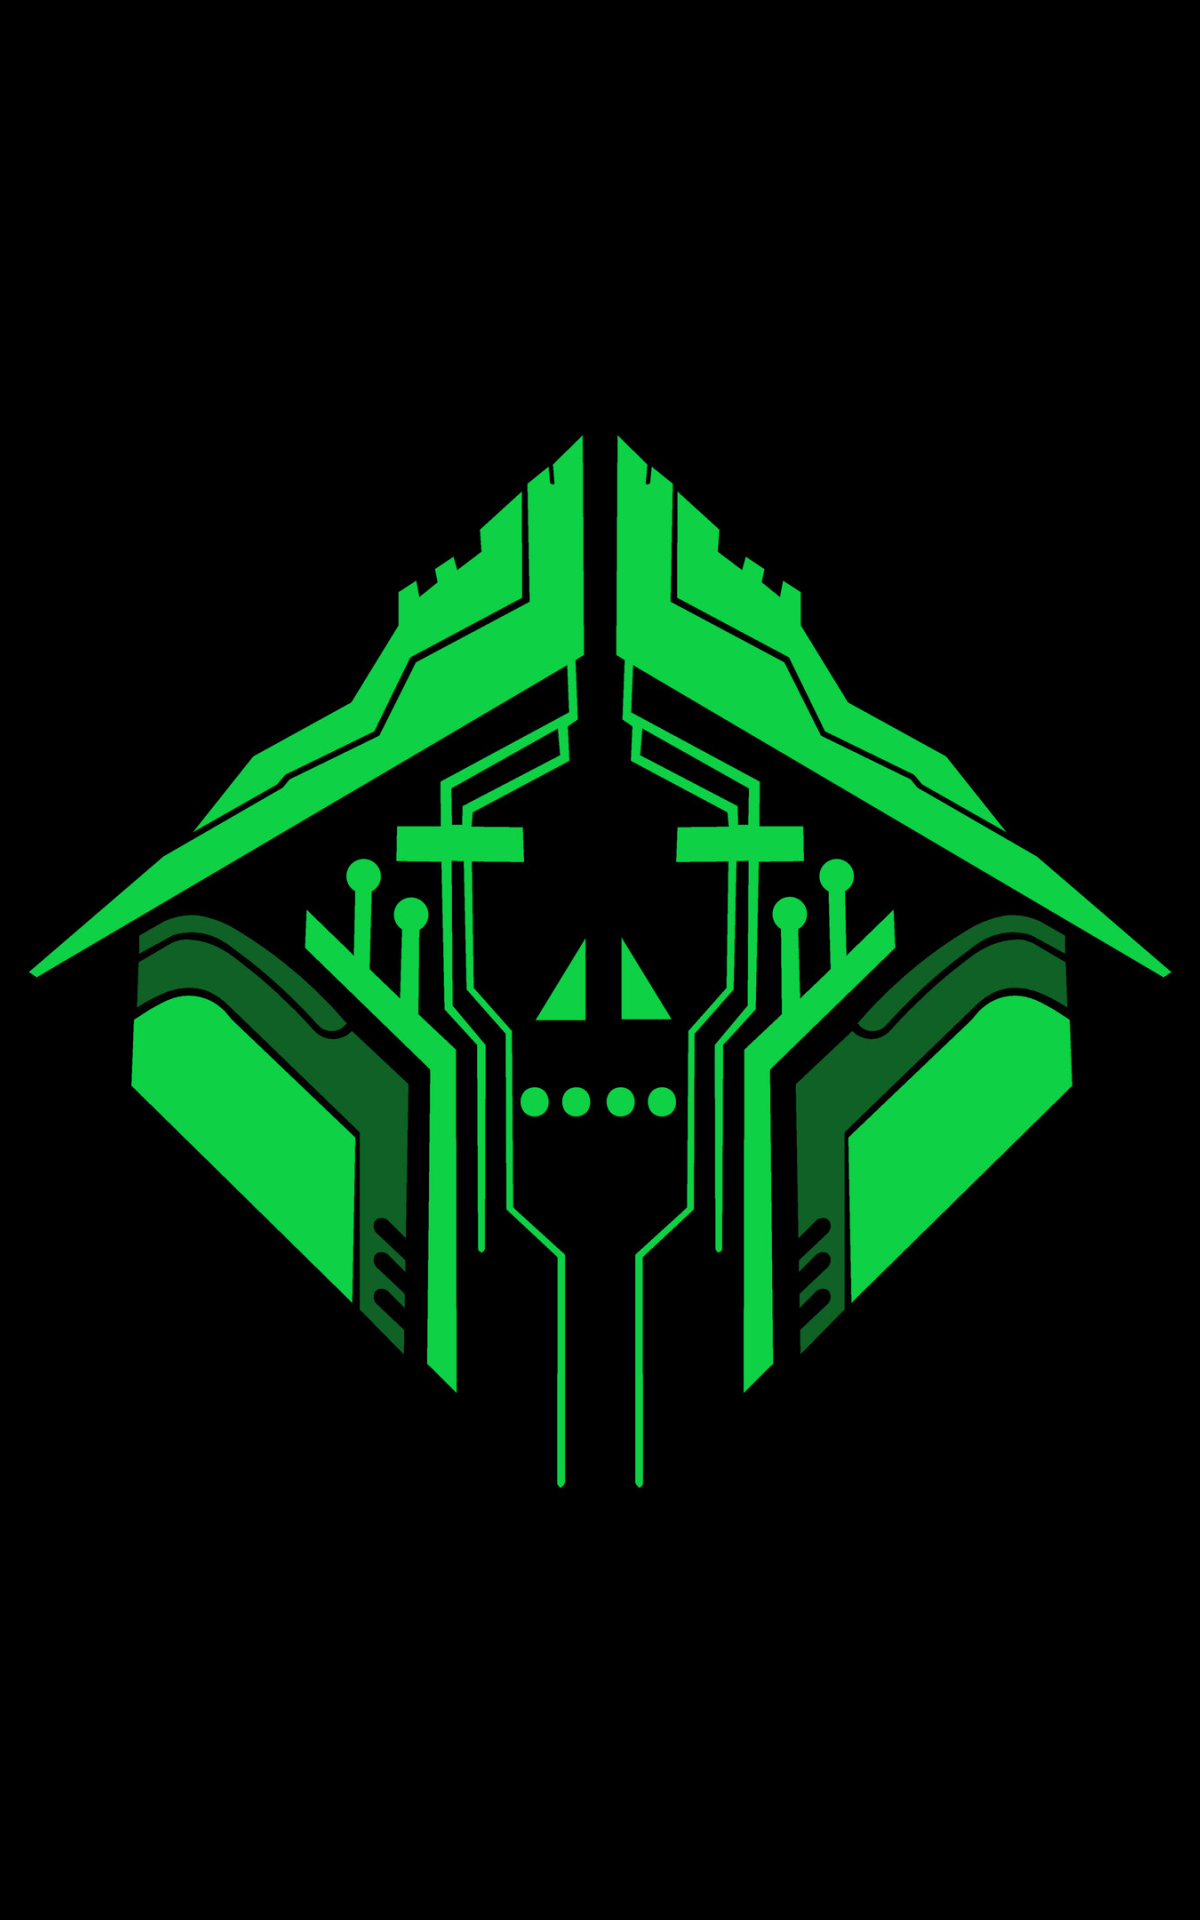 1200x1920 Crypto Apex Legends 4K Logo 1200x1920 Resolution ...